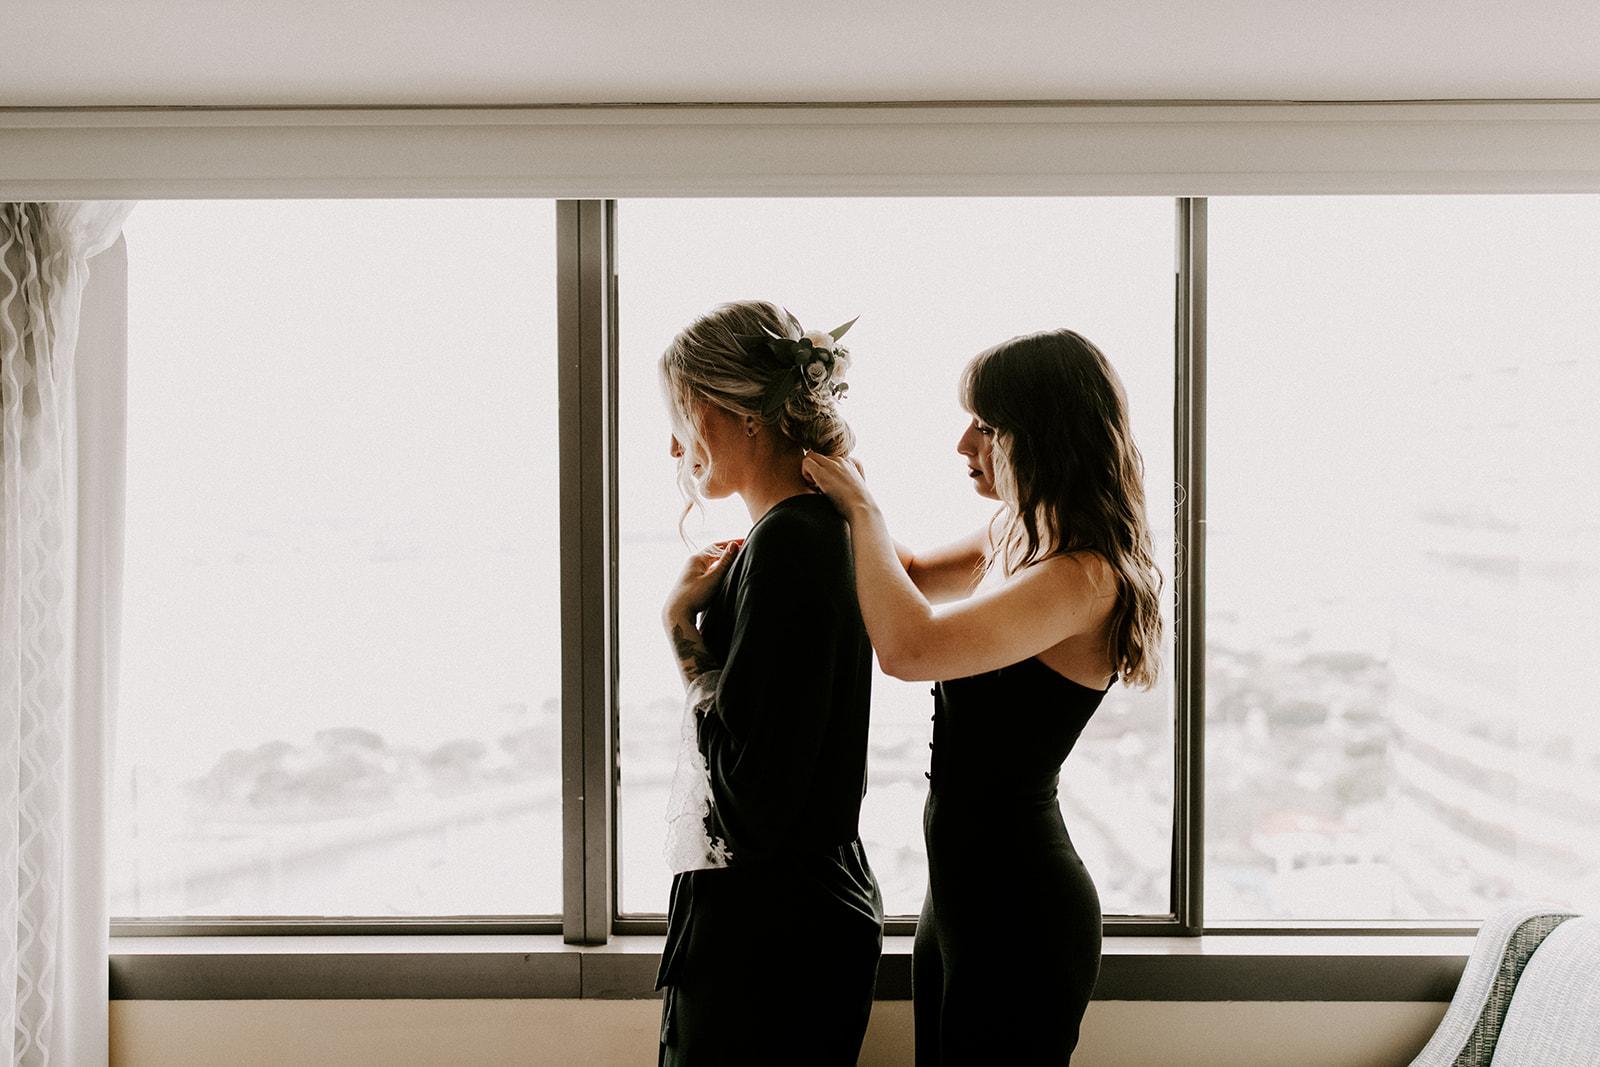 Mckenzie + Trevor The Ultimate Skybox Downtown San Diego Wedding Ellie Cole Photographer-66.jpg